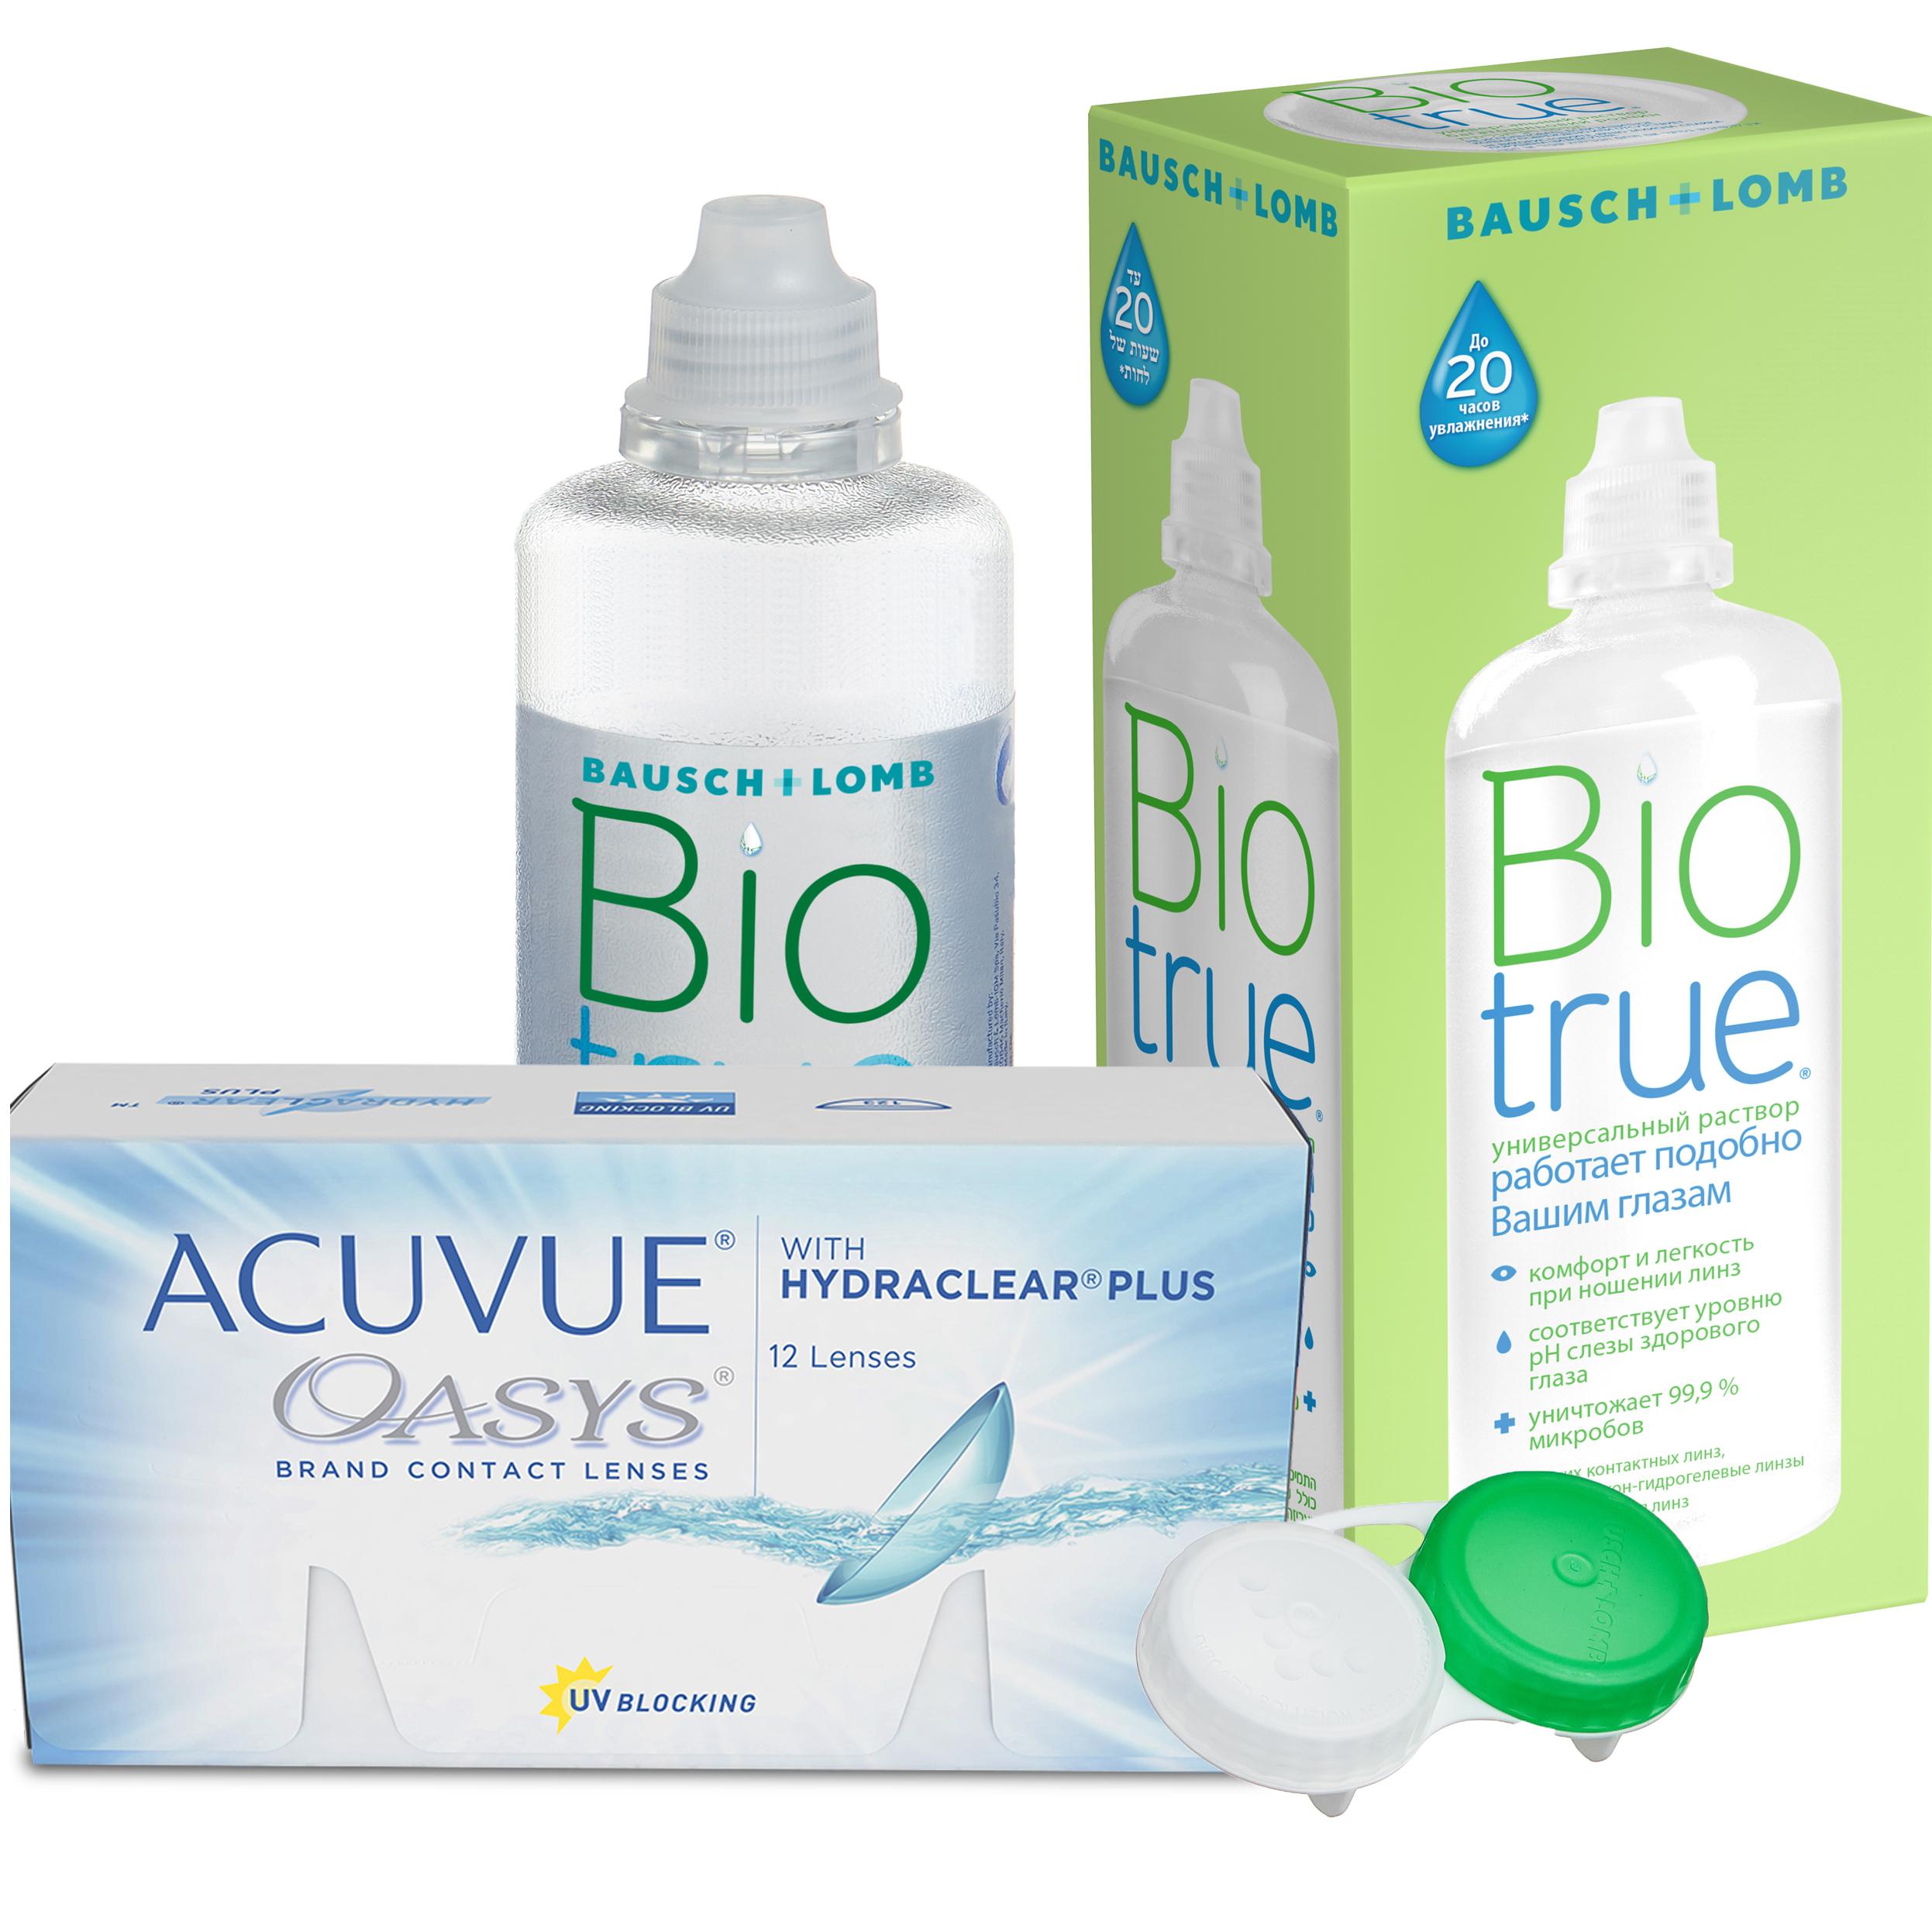 Купить Oasys with Hydraclear Plus 12 линз + Biotrue, Контактные линзы Acuvue Oasys with Hydraclear Plus 12 линз R 8.4 +5, 50 + Biotrue 300 мл